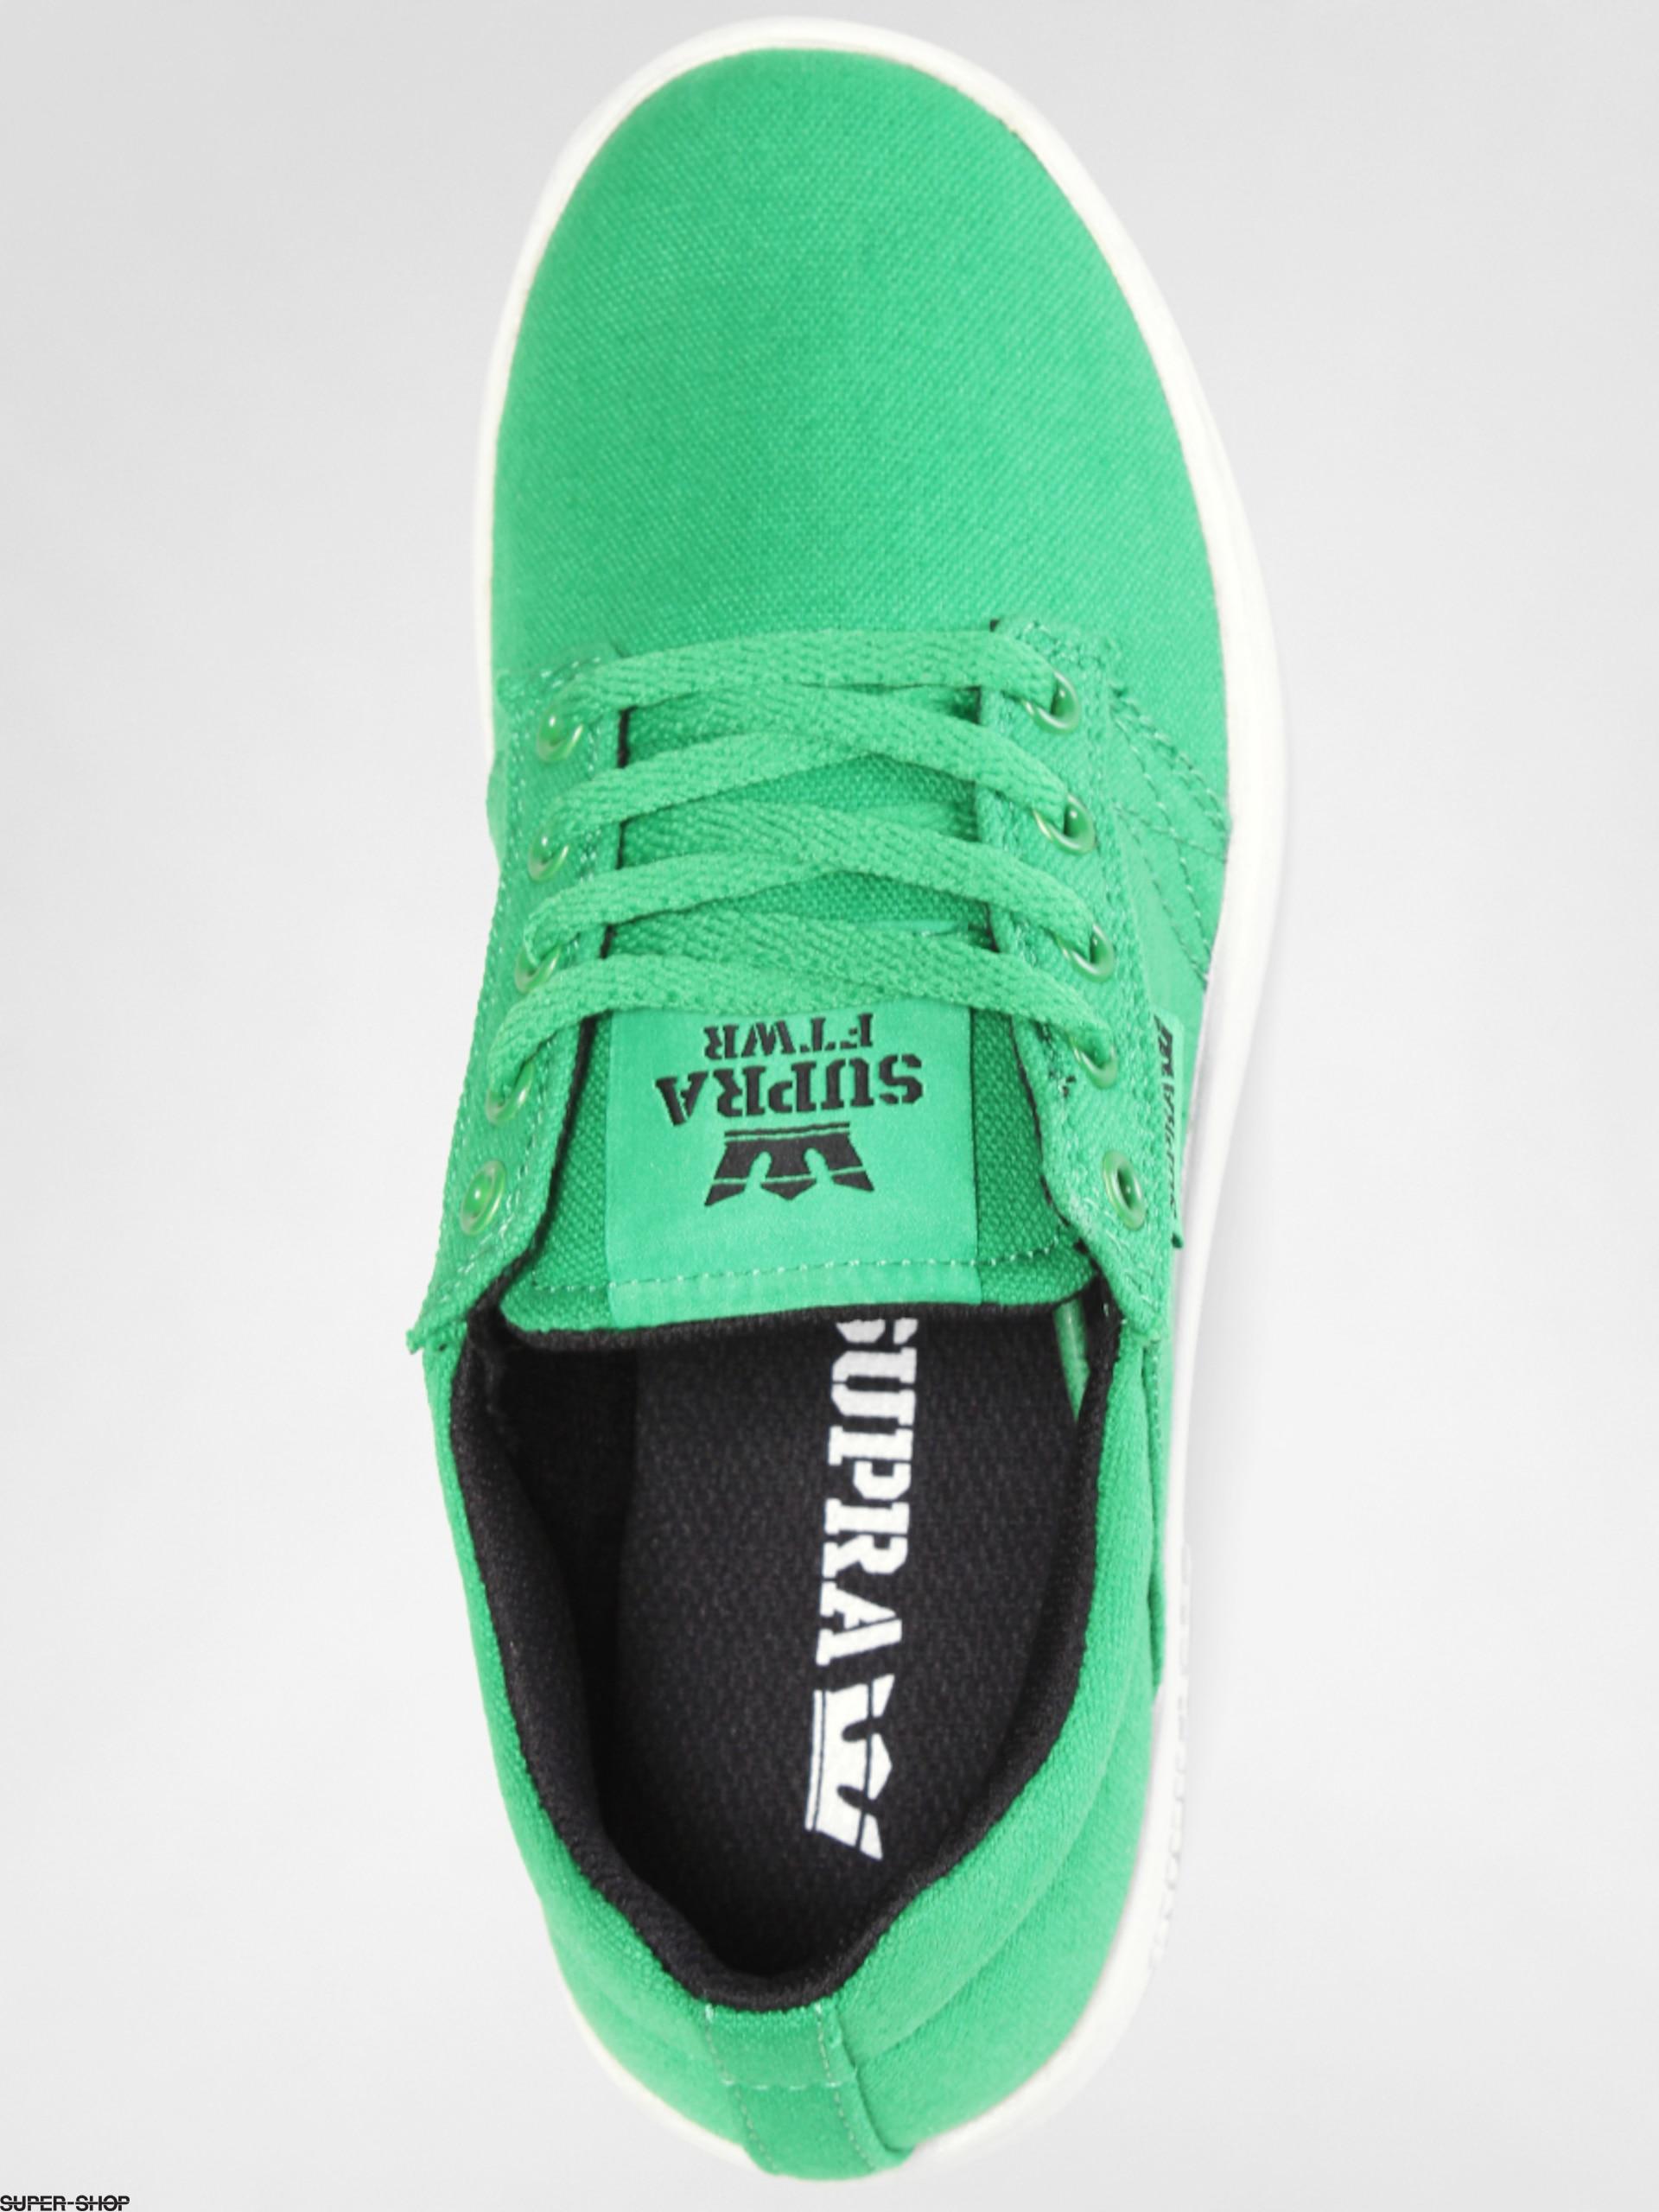 56a168de134c Supra Kids shoes Kids Westway S12011K (geb)